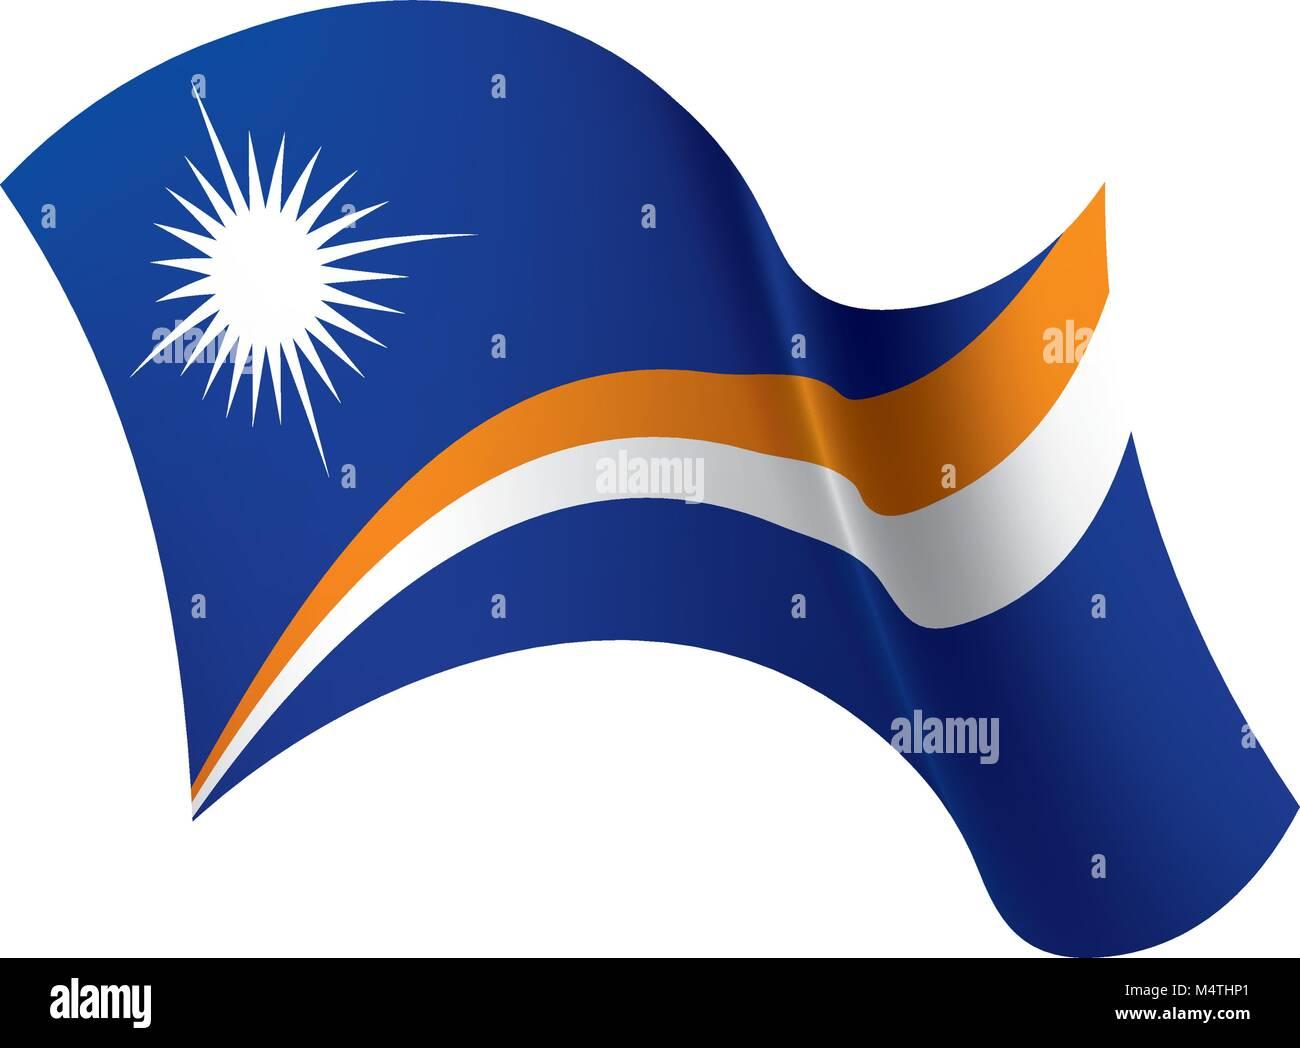 Marshall Islands flag, vector illustration - Stock Image